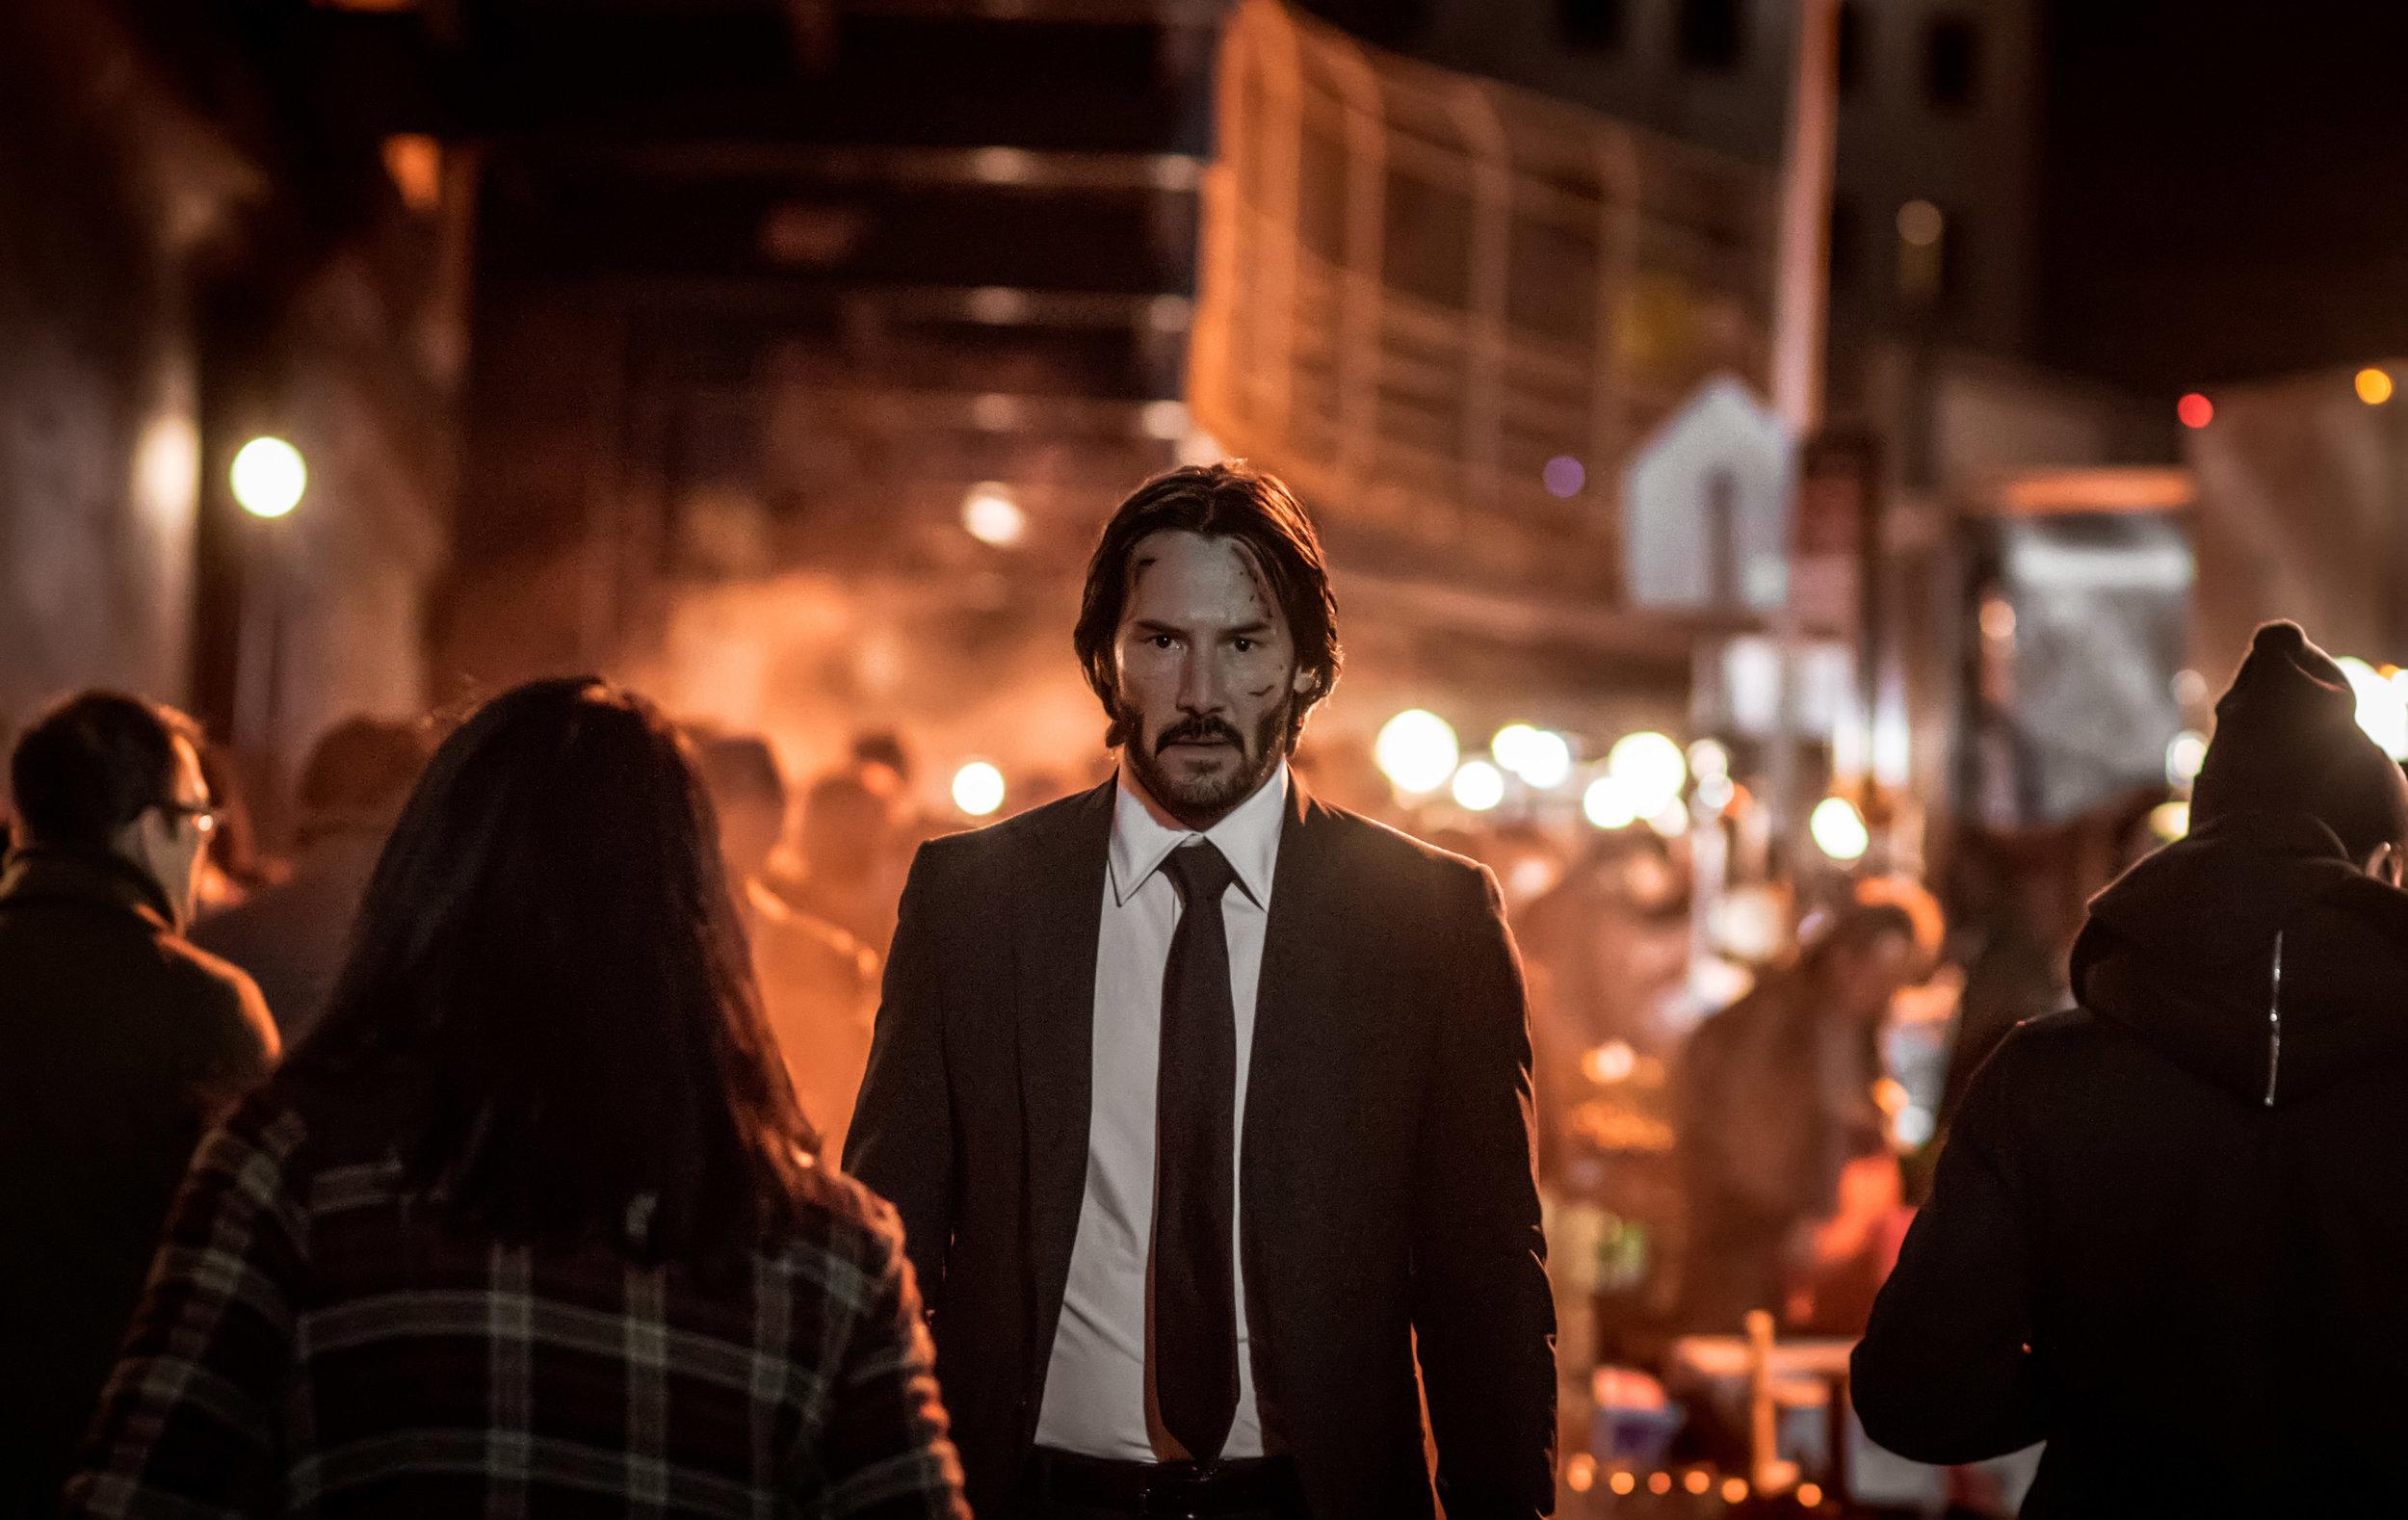 Images courtesy of Lionsgate Publicity